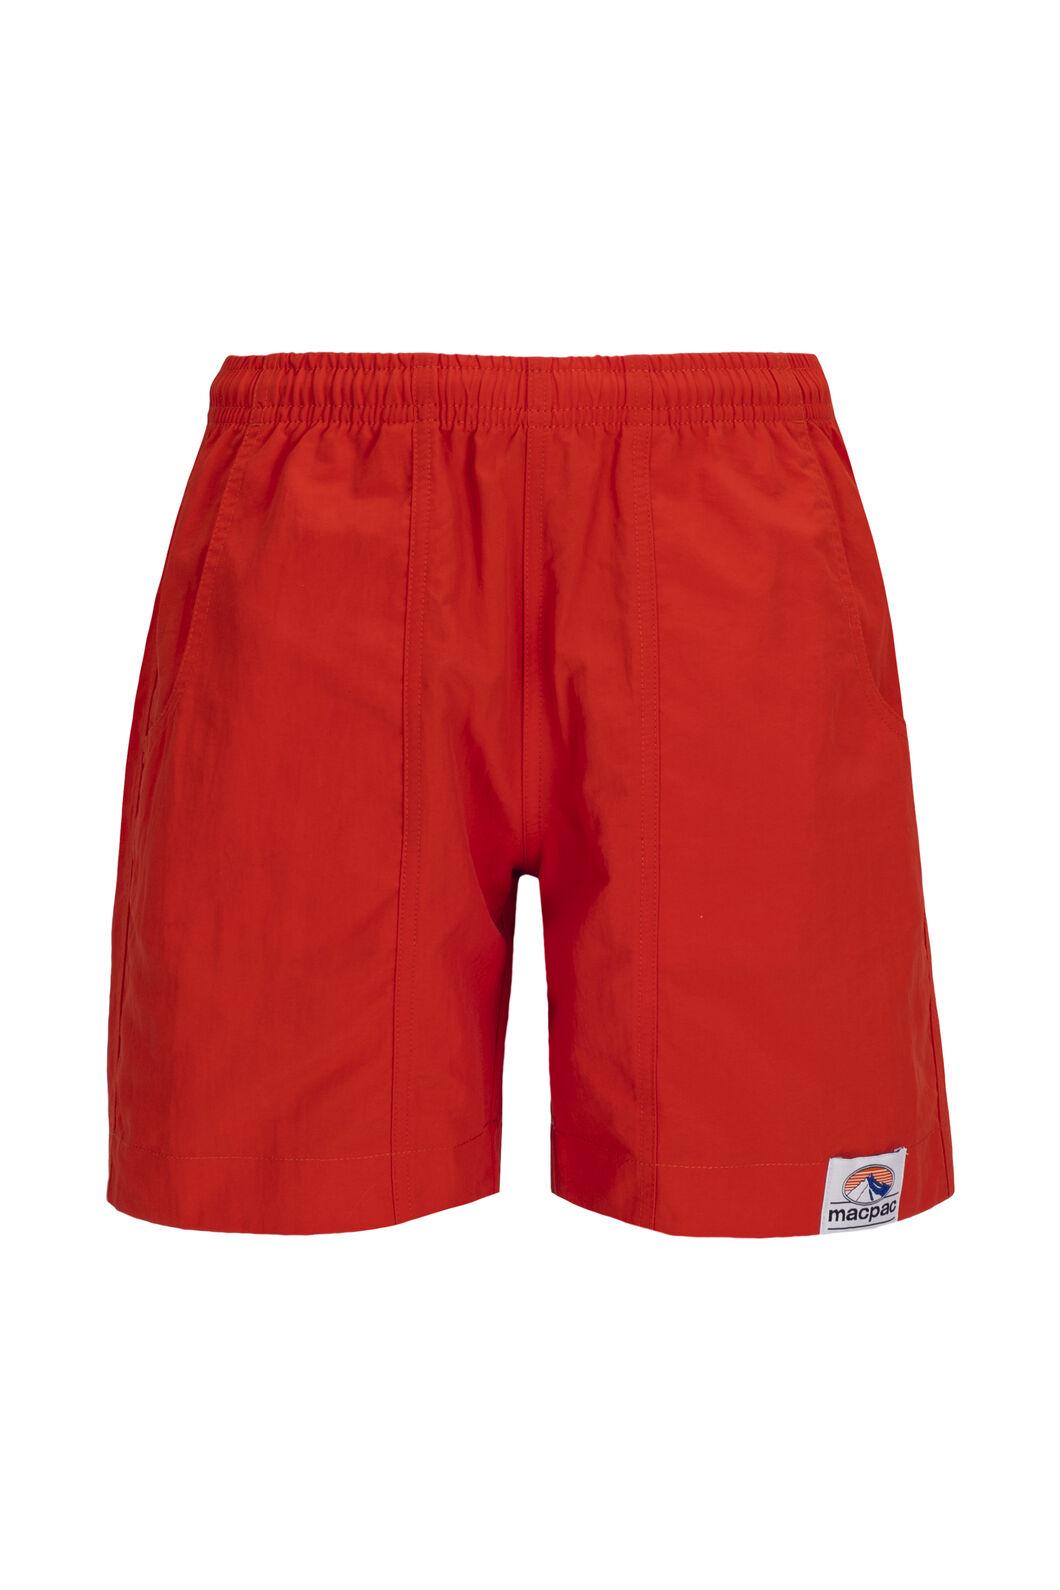 Macpac Winger Shorts — Kids', Pureed Pumpkin, hi-res